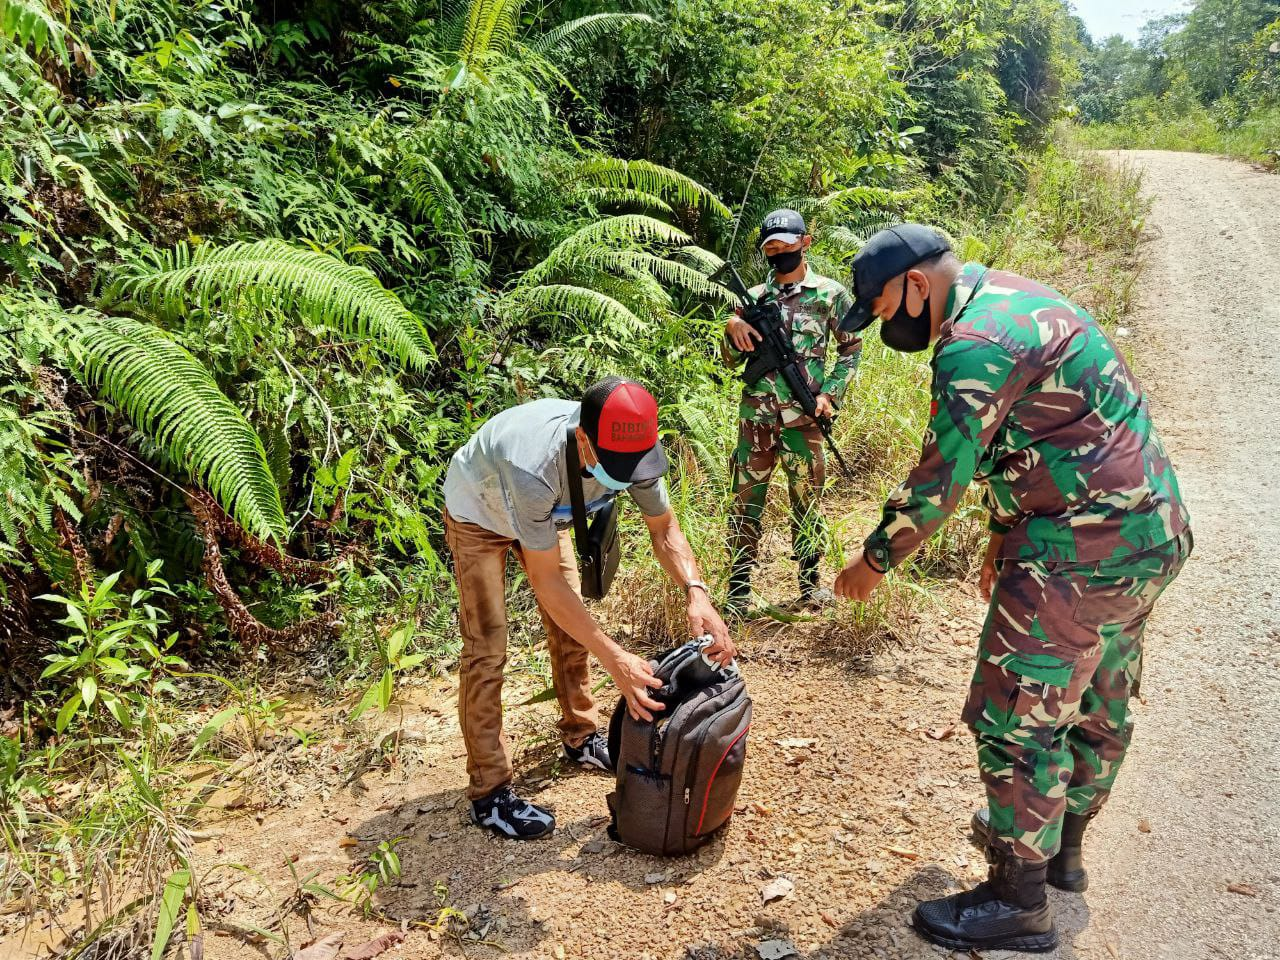 TNI Amankan Puluhan Orang PMI dan Miras Ilegal di Perbatasan RI - Malaysia